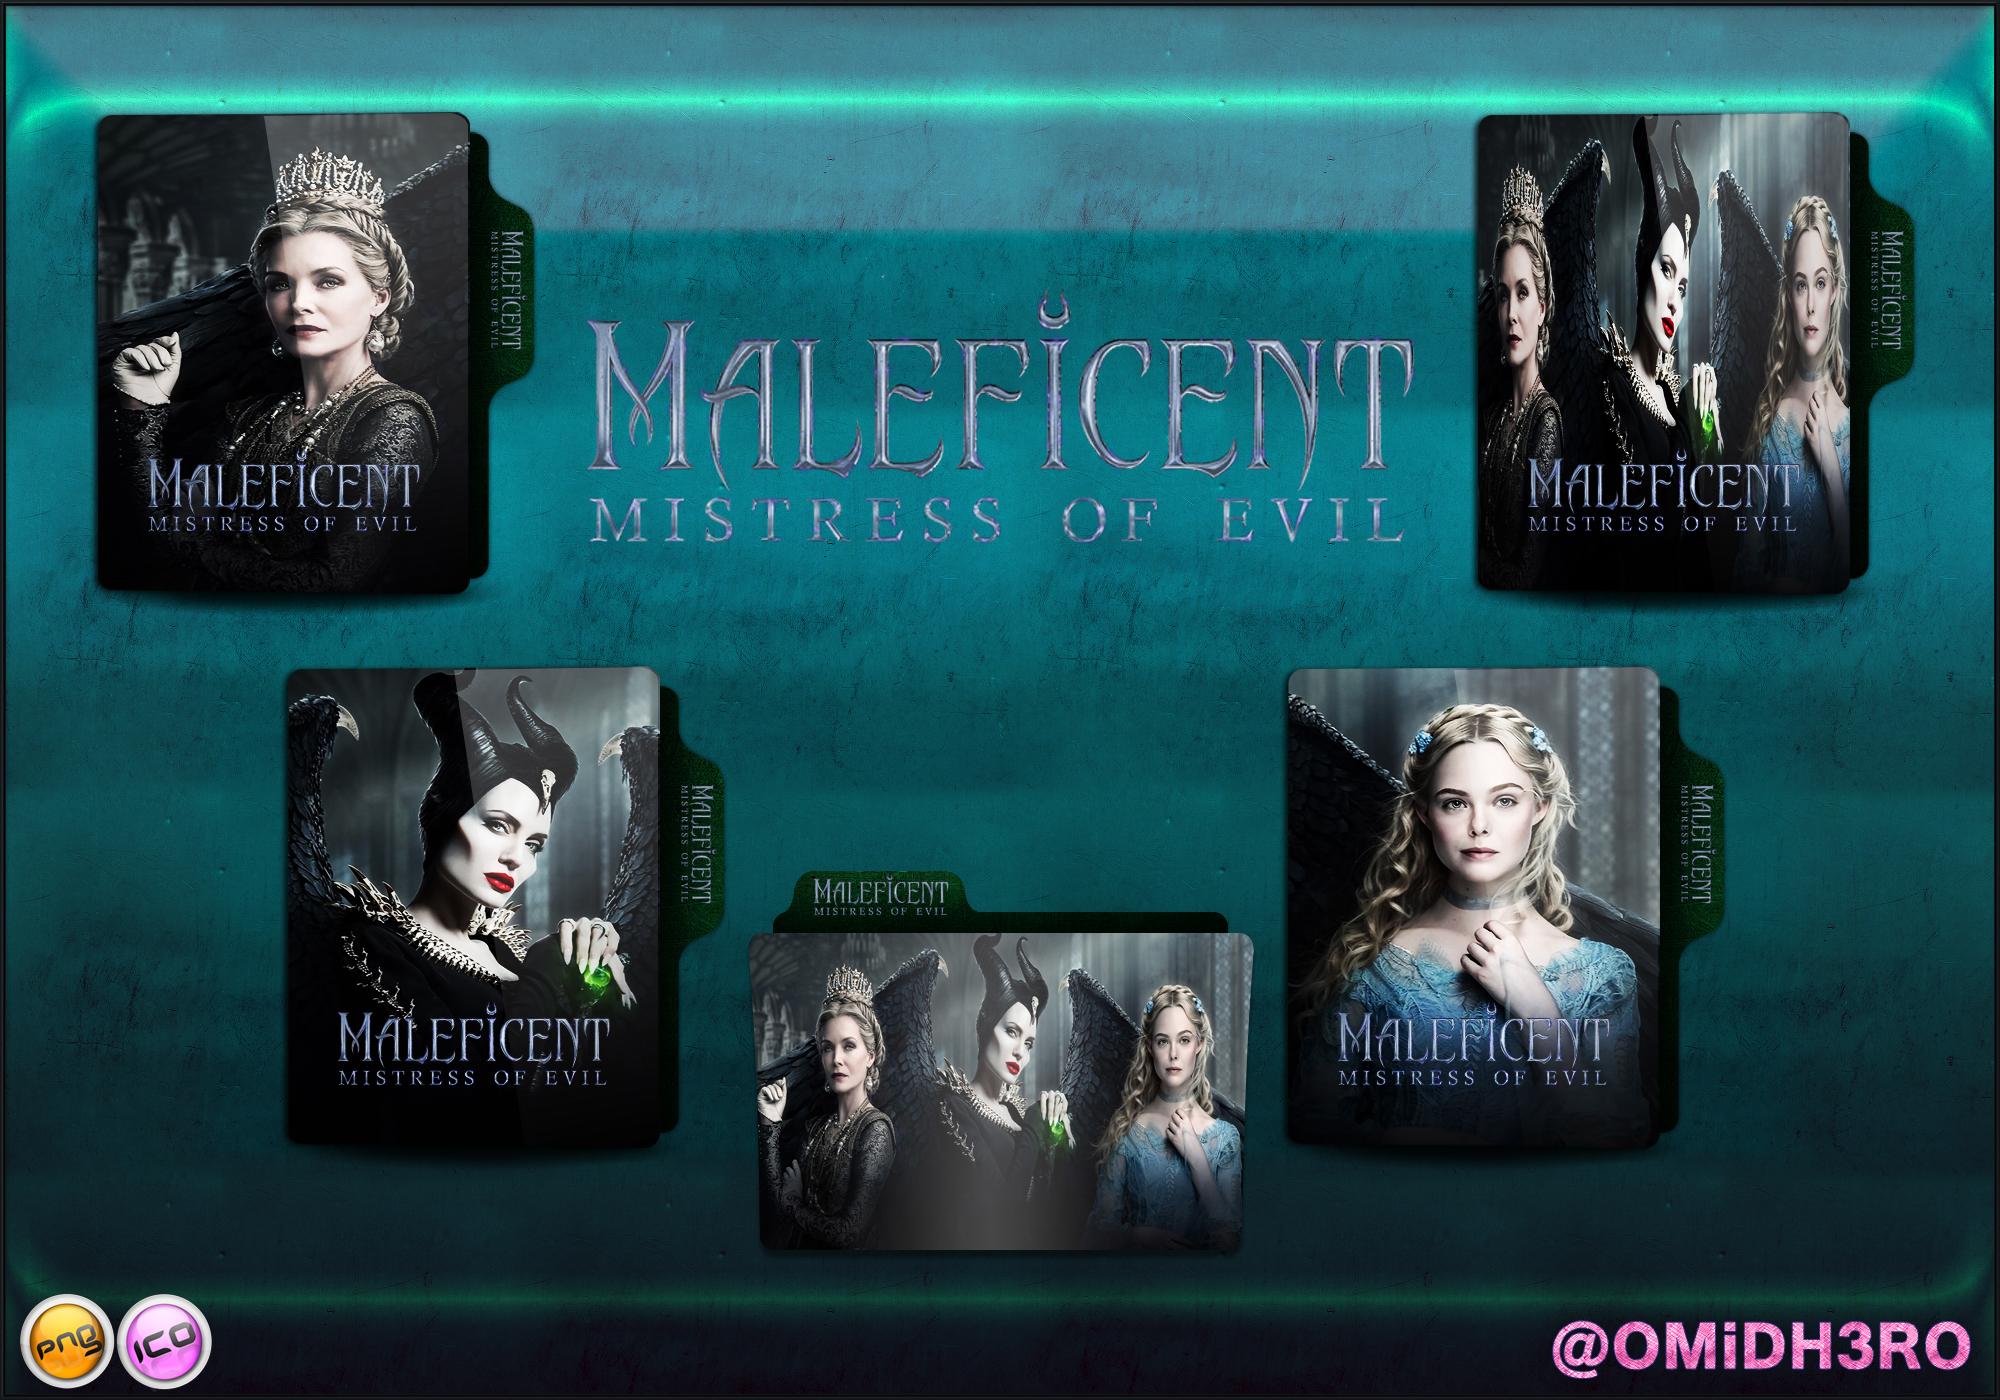 Maleficent Mistress Of Evil 2019 Folder Icon By Omidh3ro On Deviantart